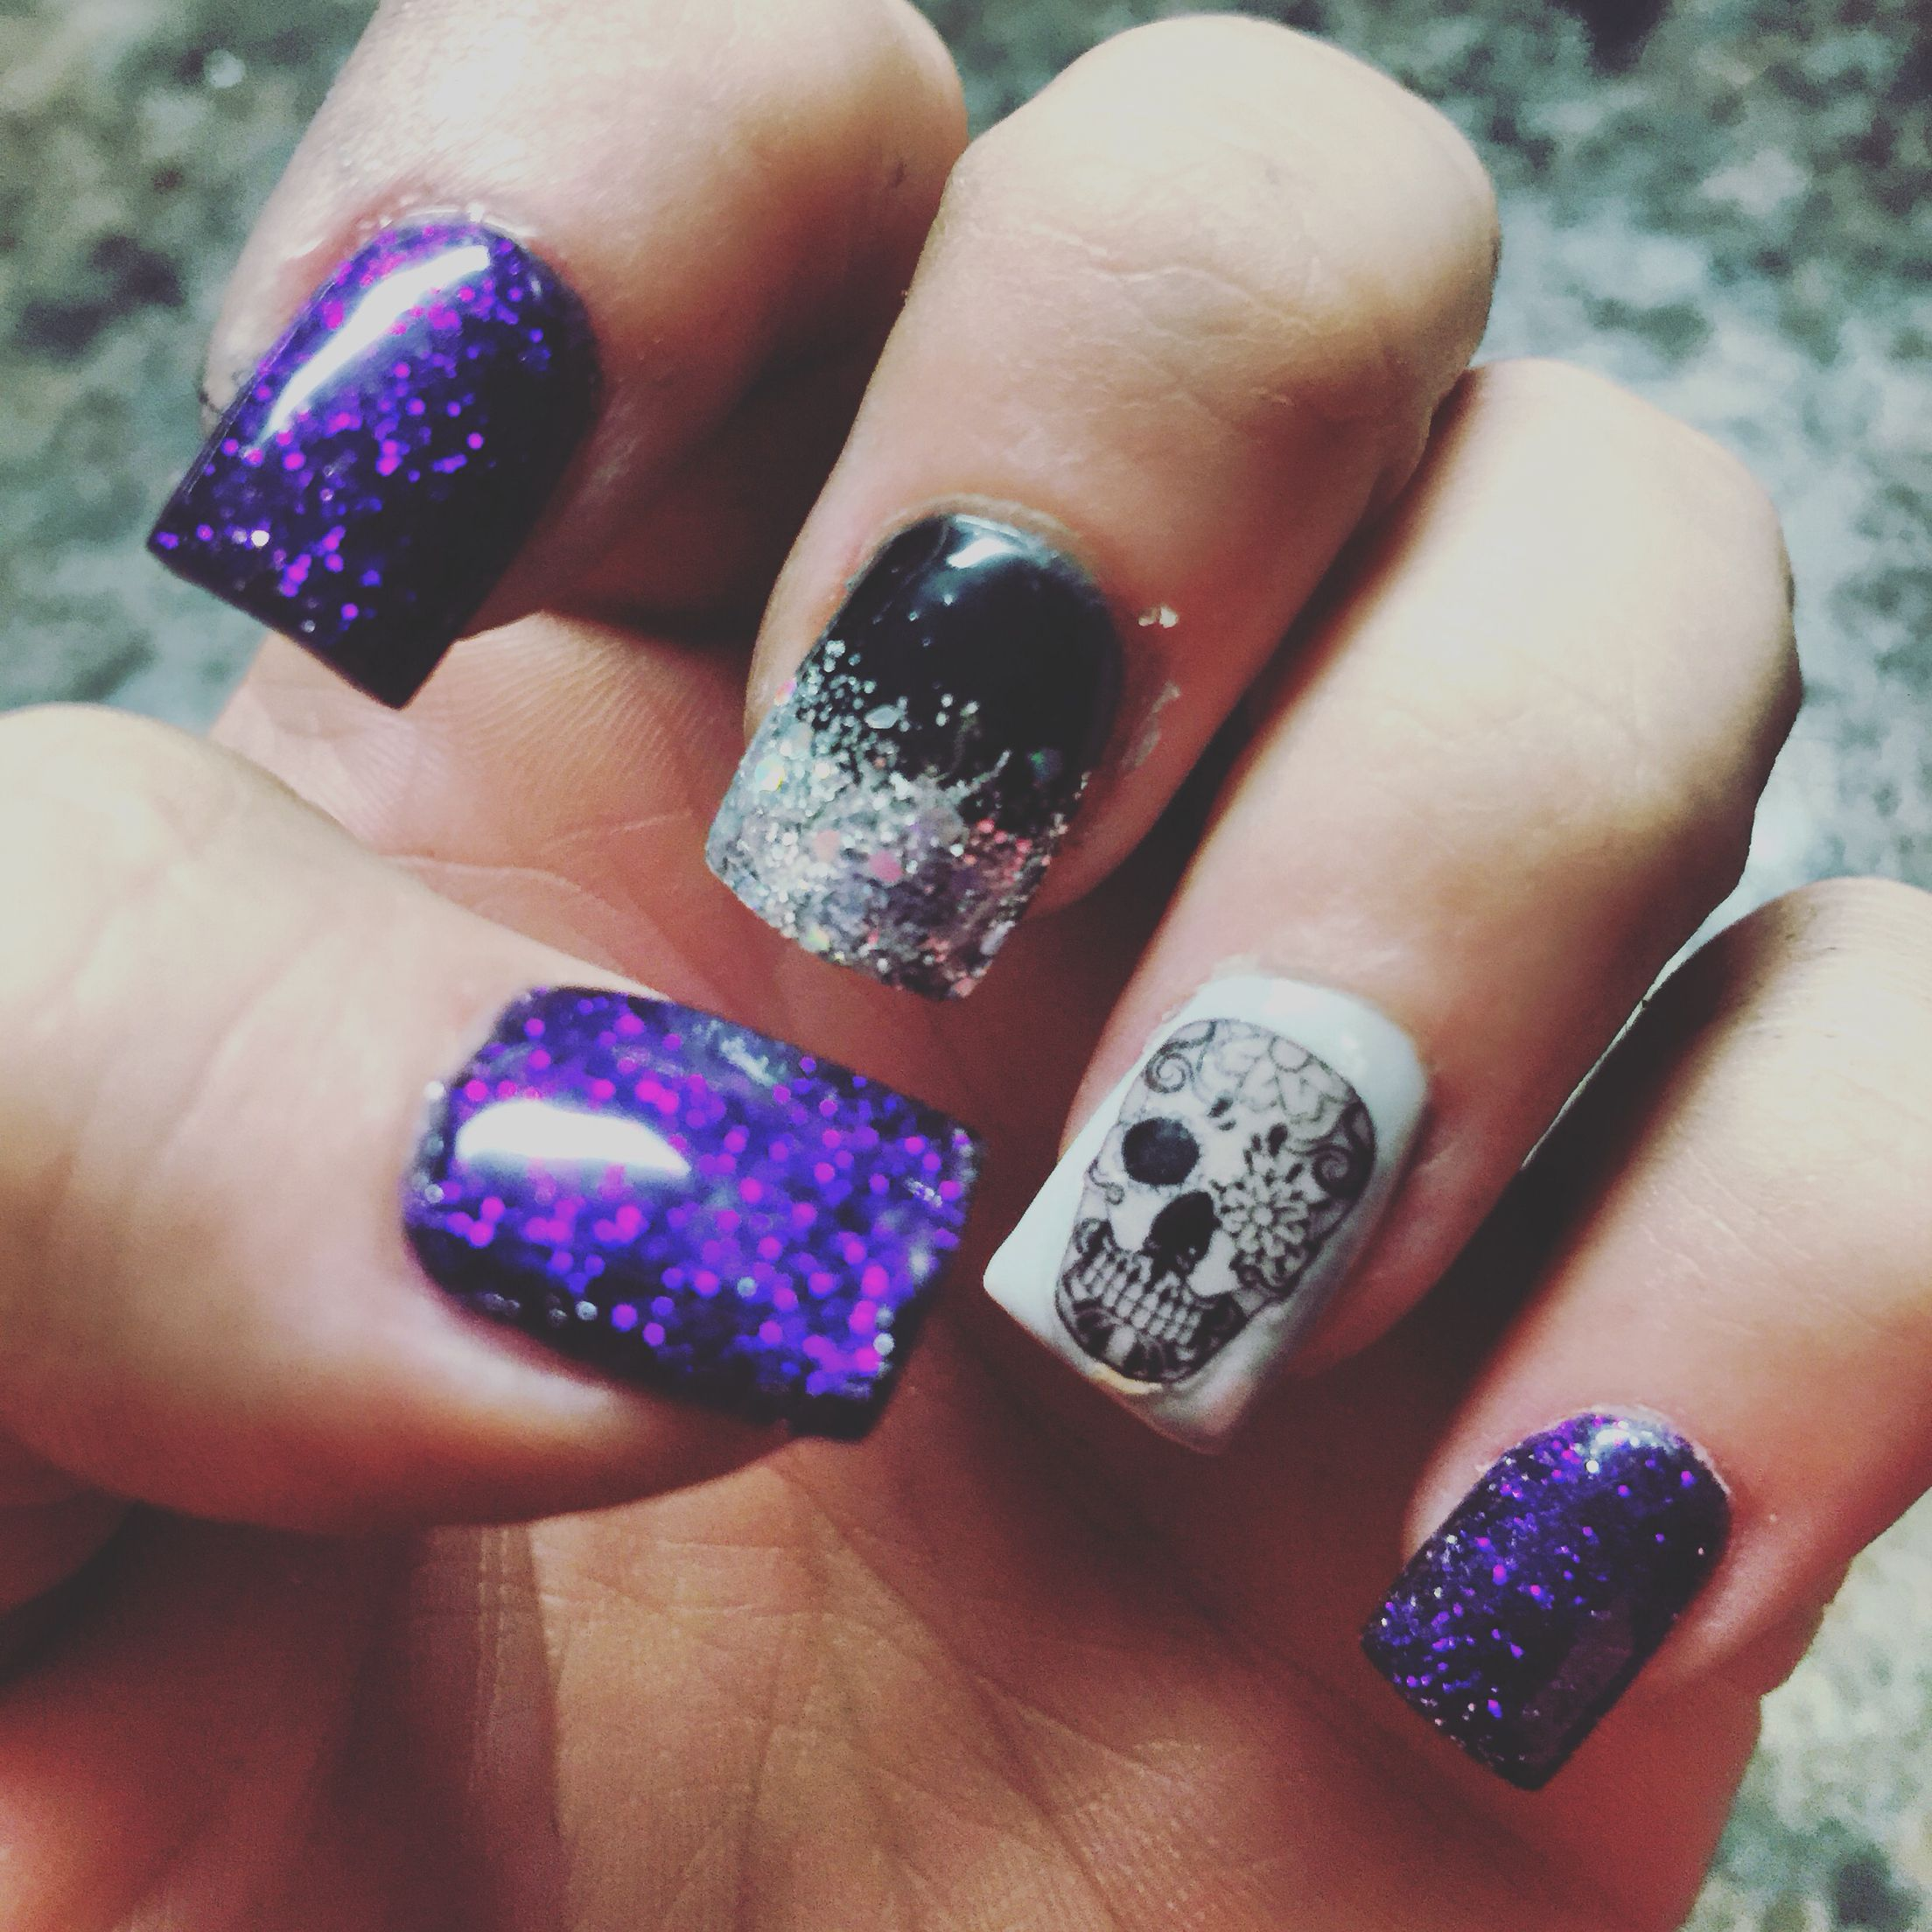 My Halloween nails! Sugar skulls with purple glitter ...